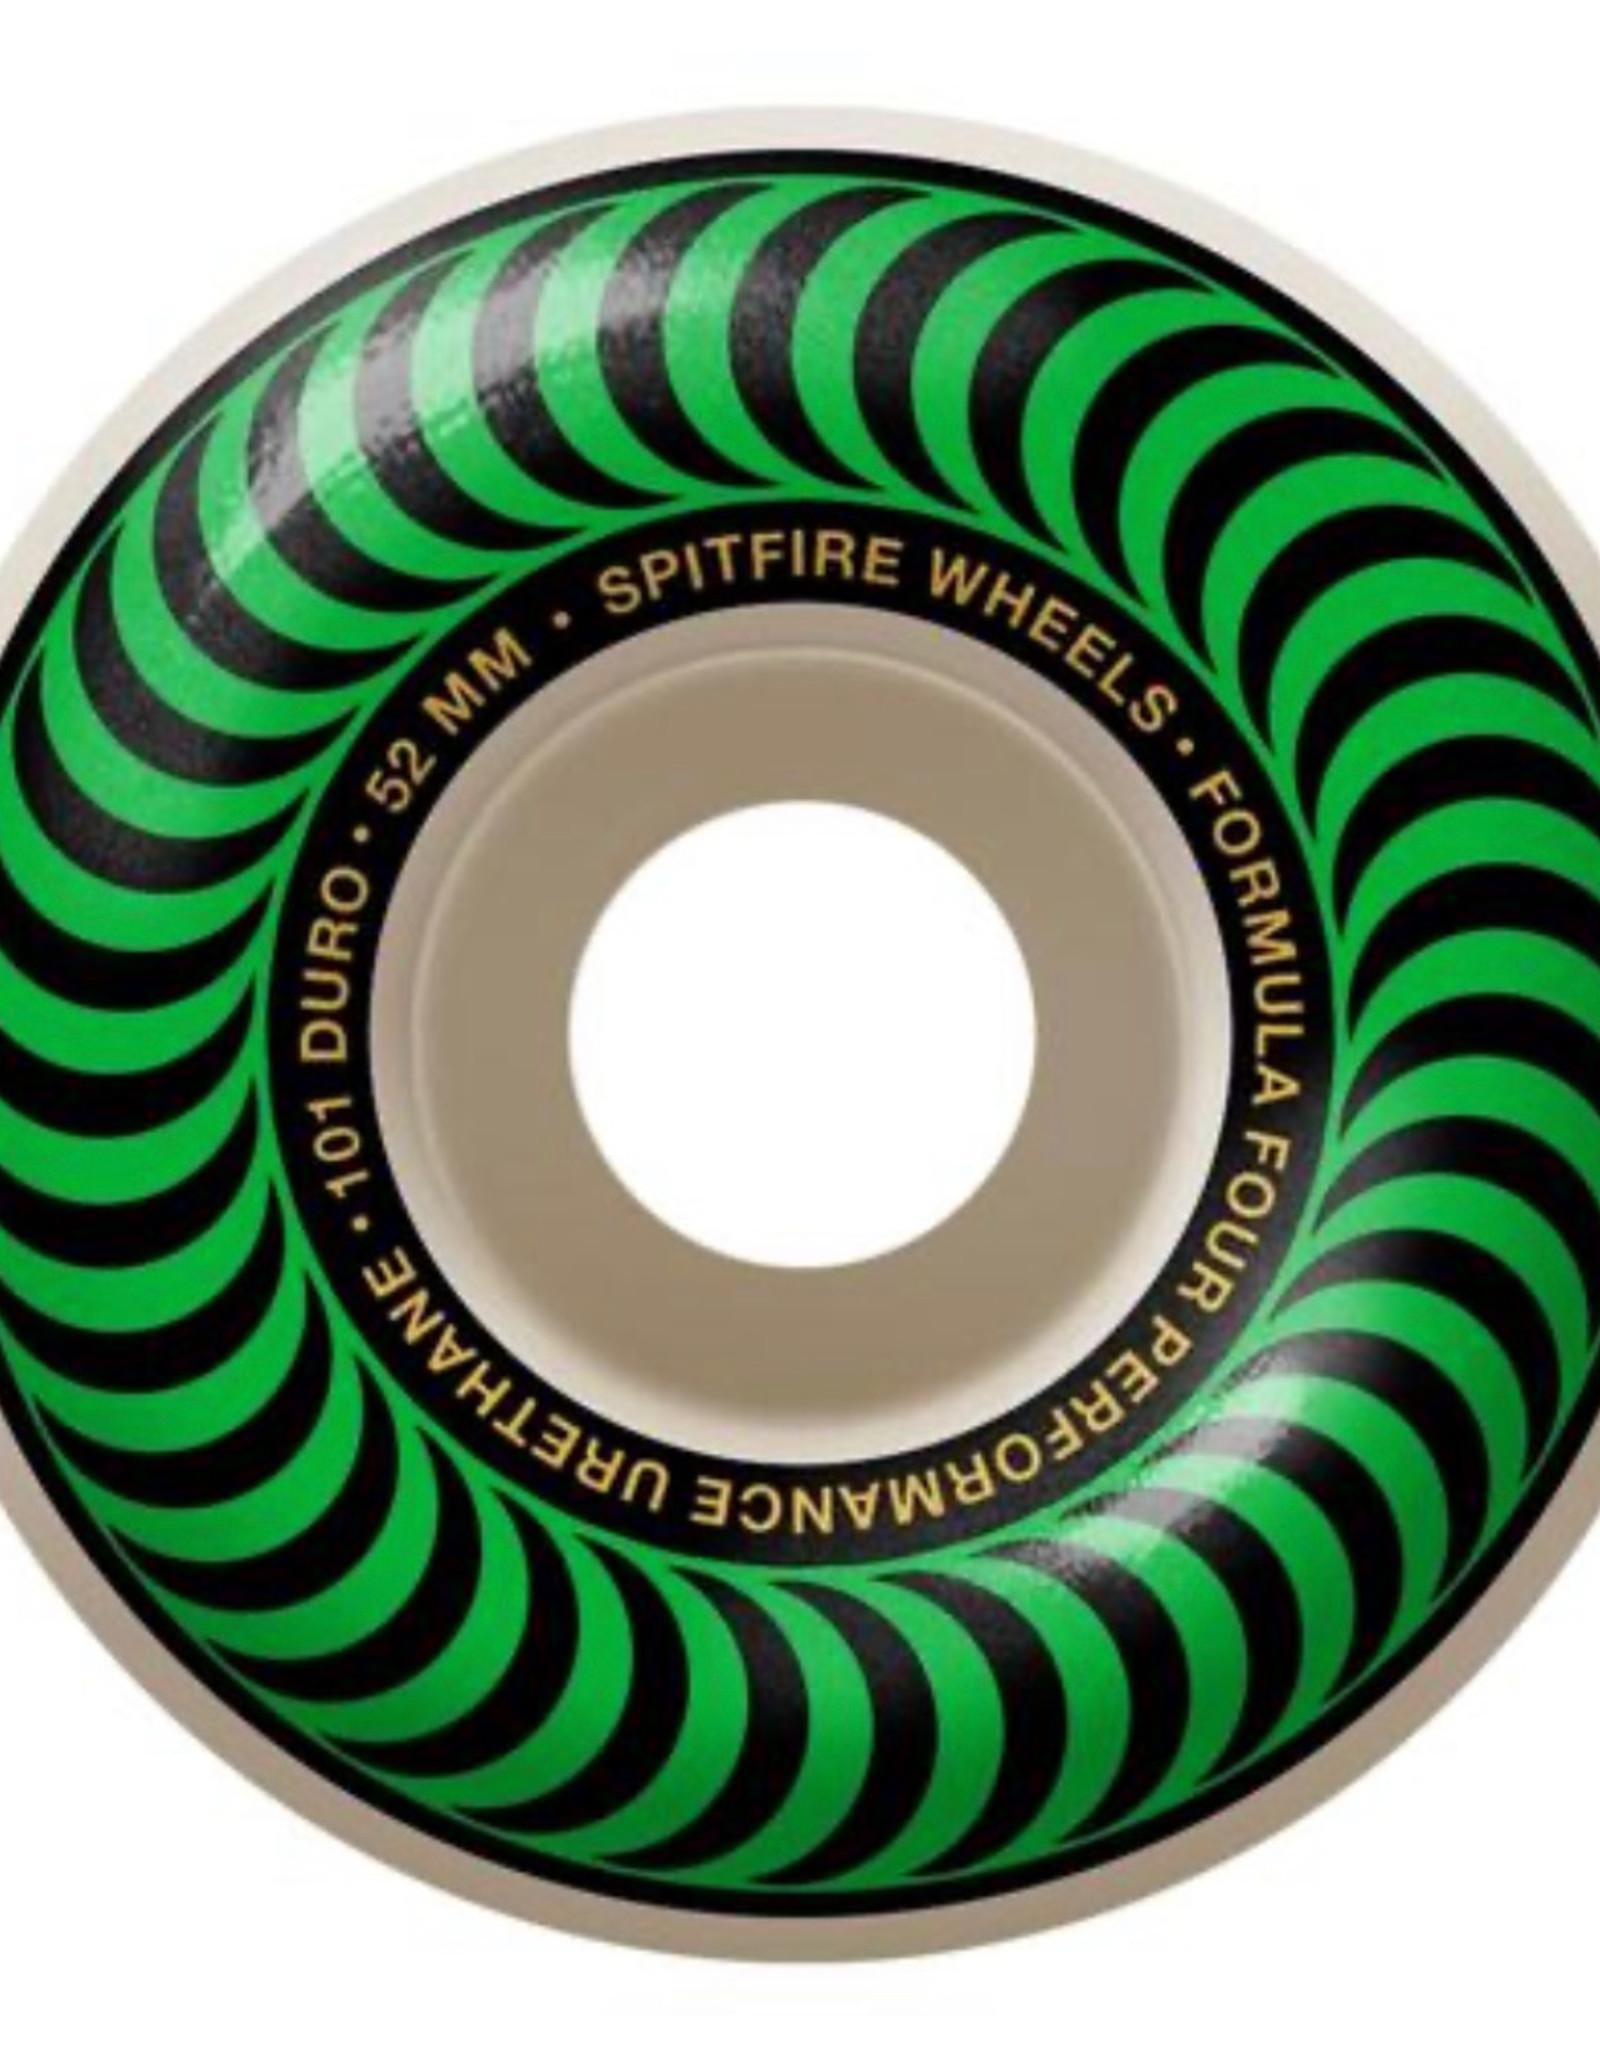 SPITFIRE F4 101 CLASSICS WHEEL (ALL SIZES)